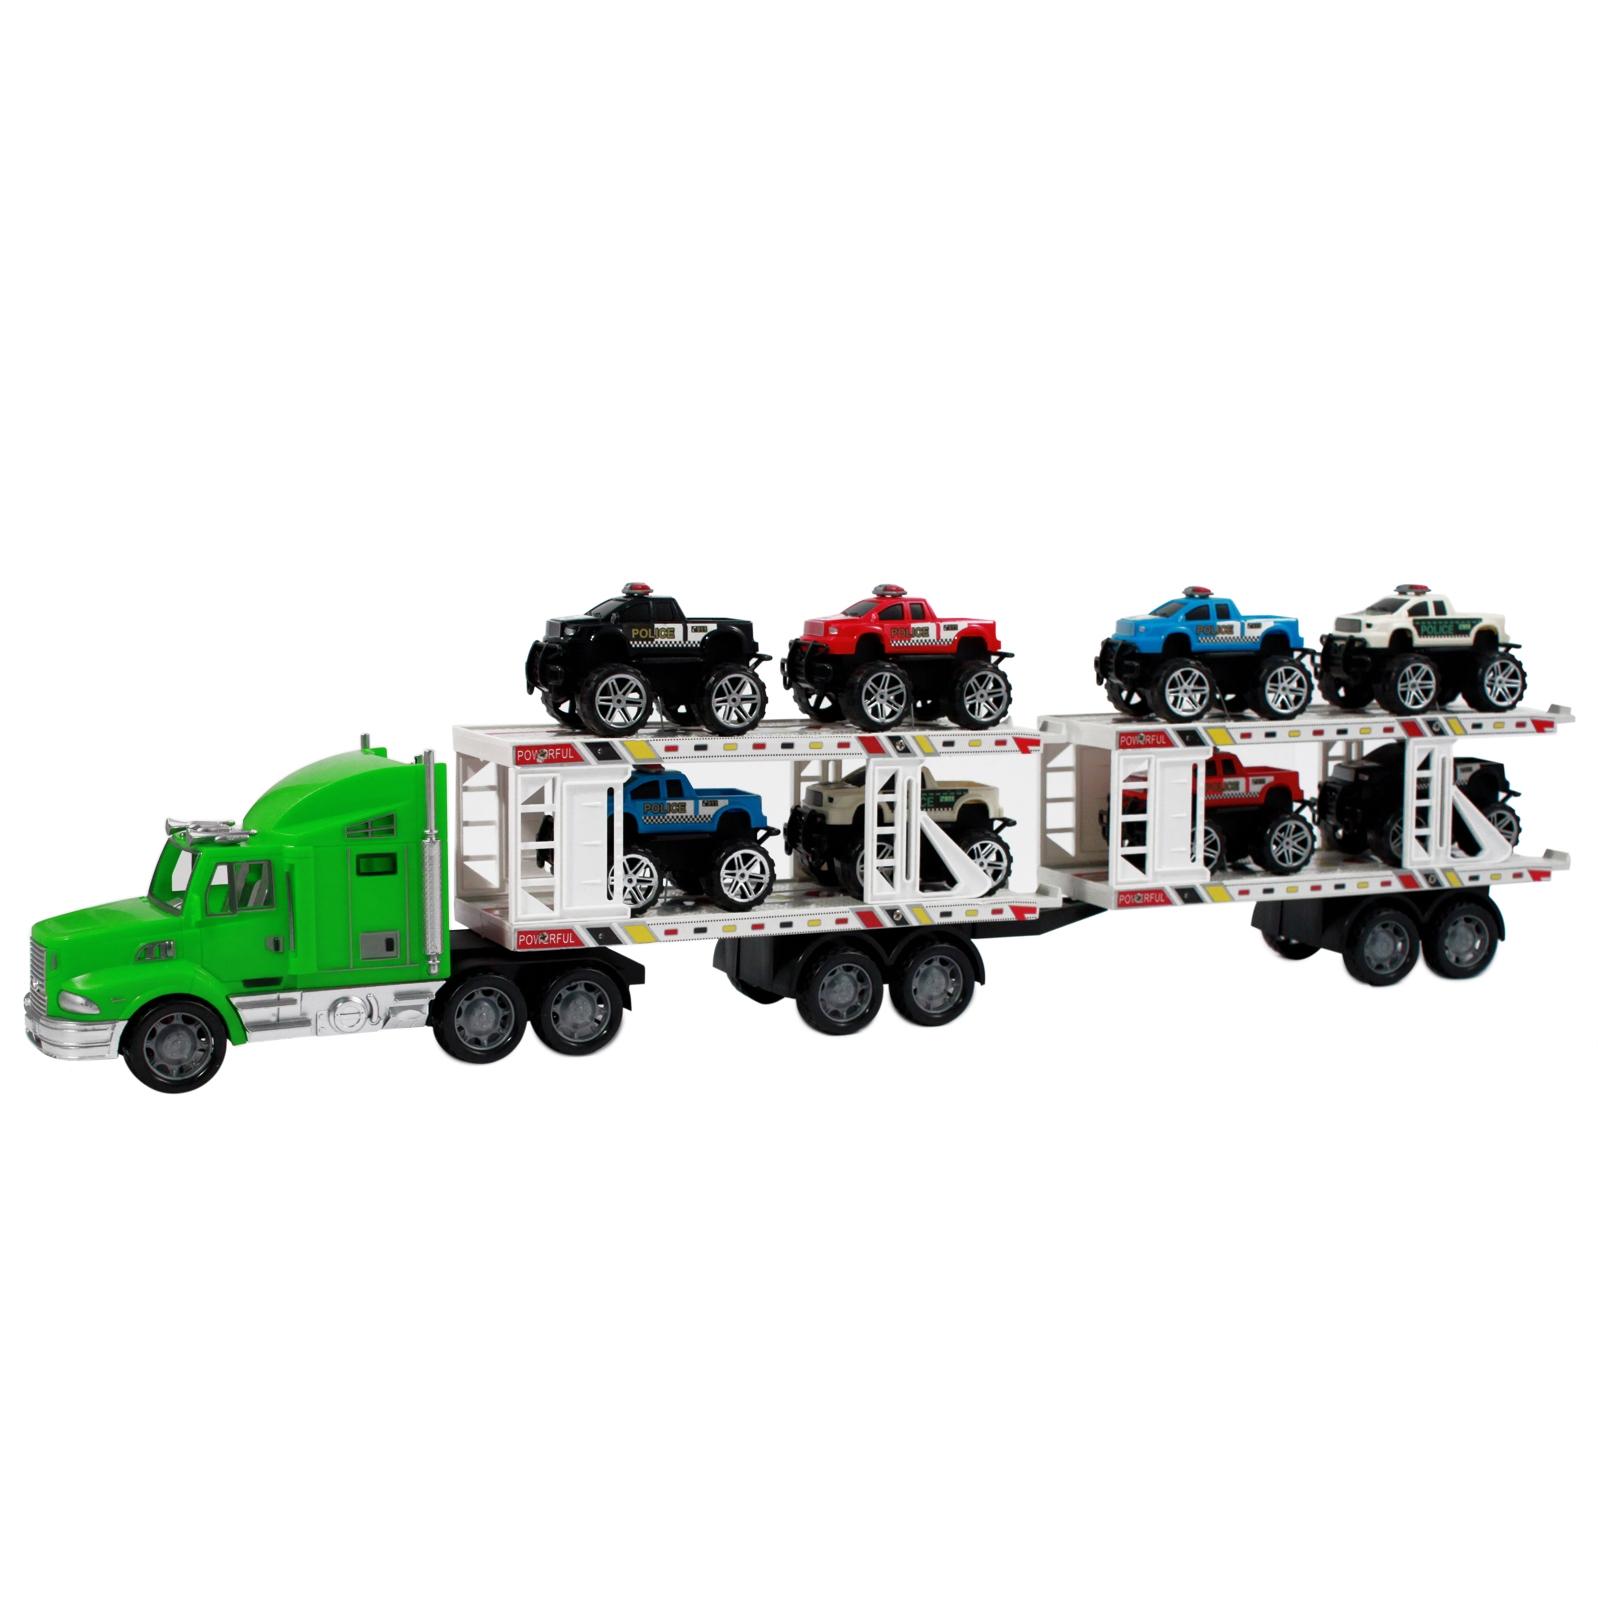 Deluxe Semi Truck Auto Hauler in Bright and Shiny Green